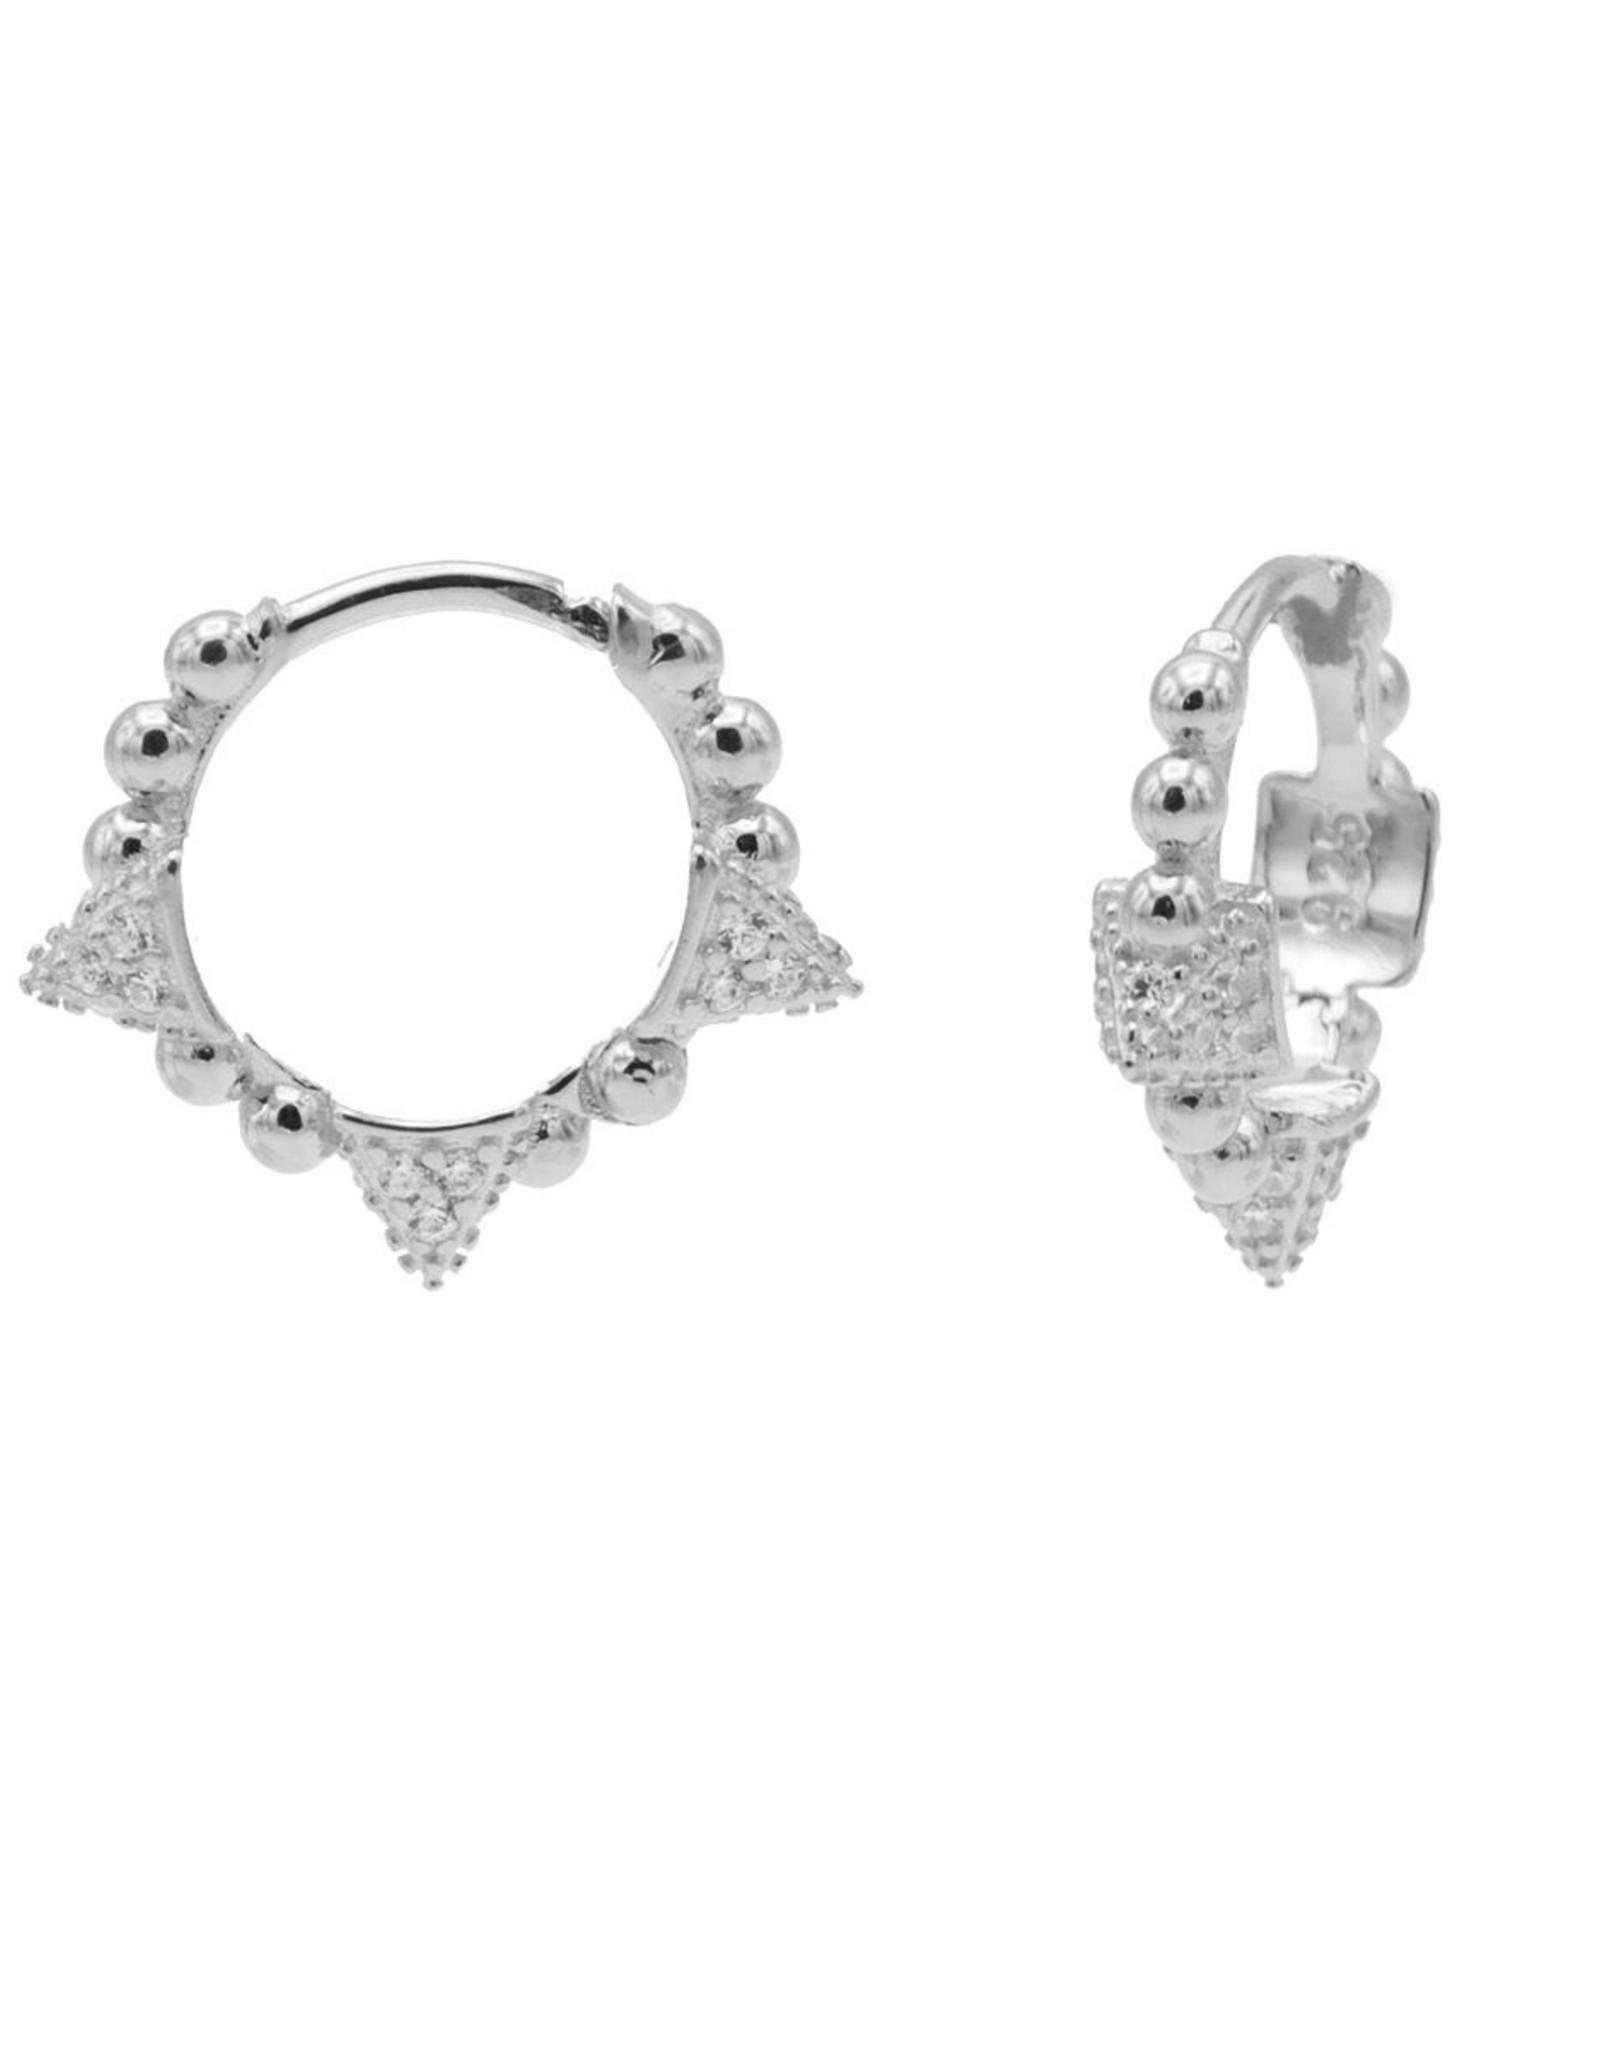 Karma Plain Zirconia Hinged Hoops Triple Studs 13MM Silver Set